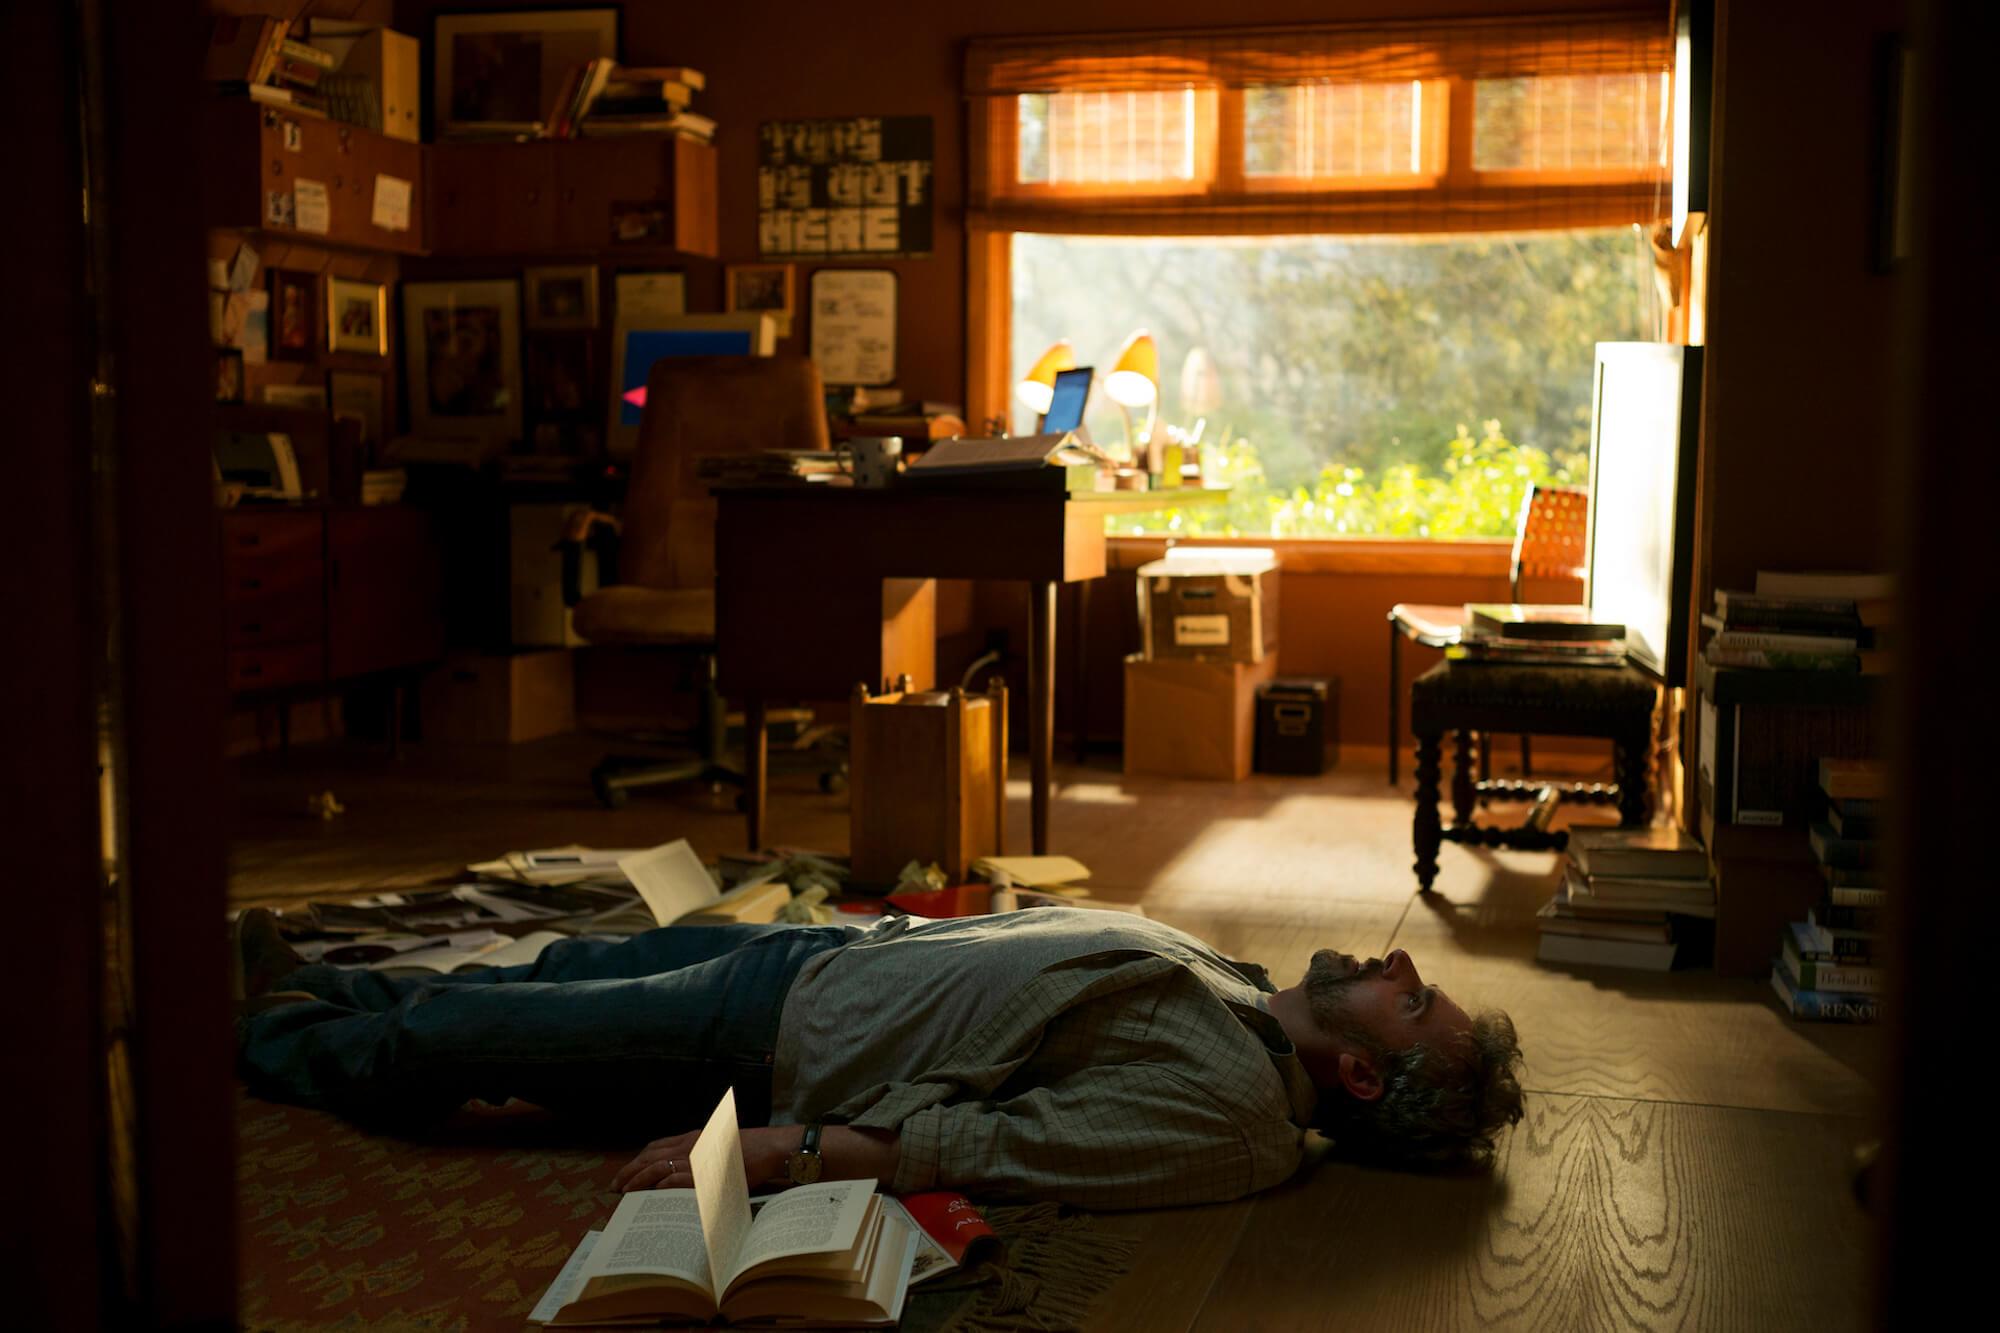 Steve Carell stars as David Scheff in BEAUTIFUL BOY